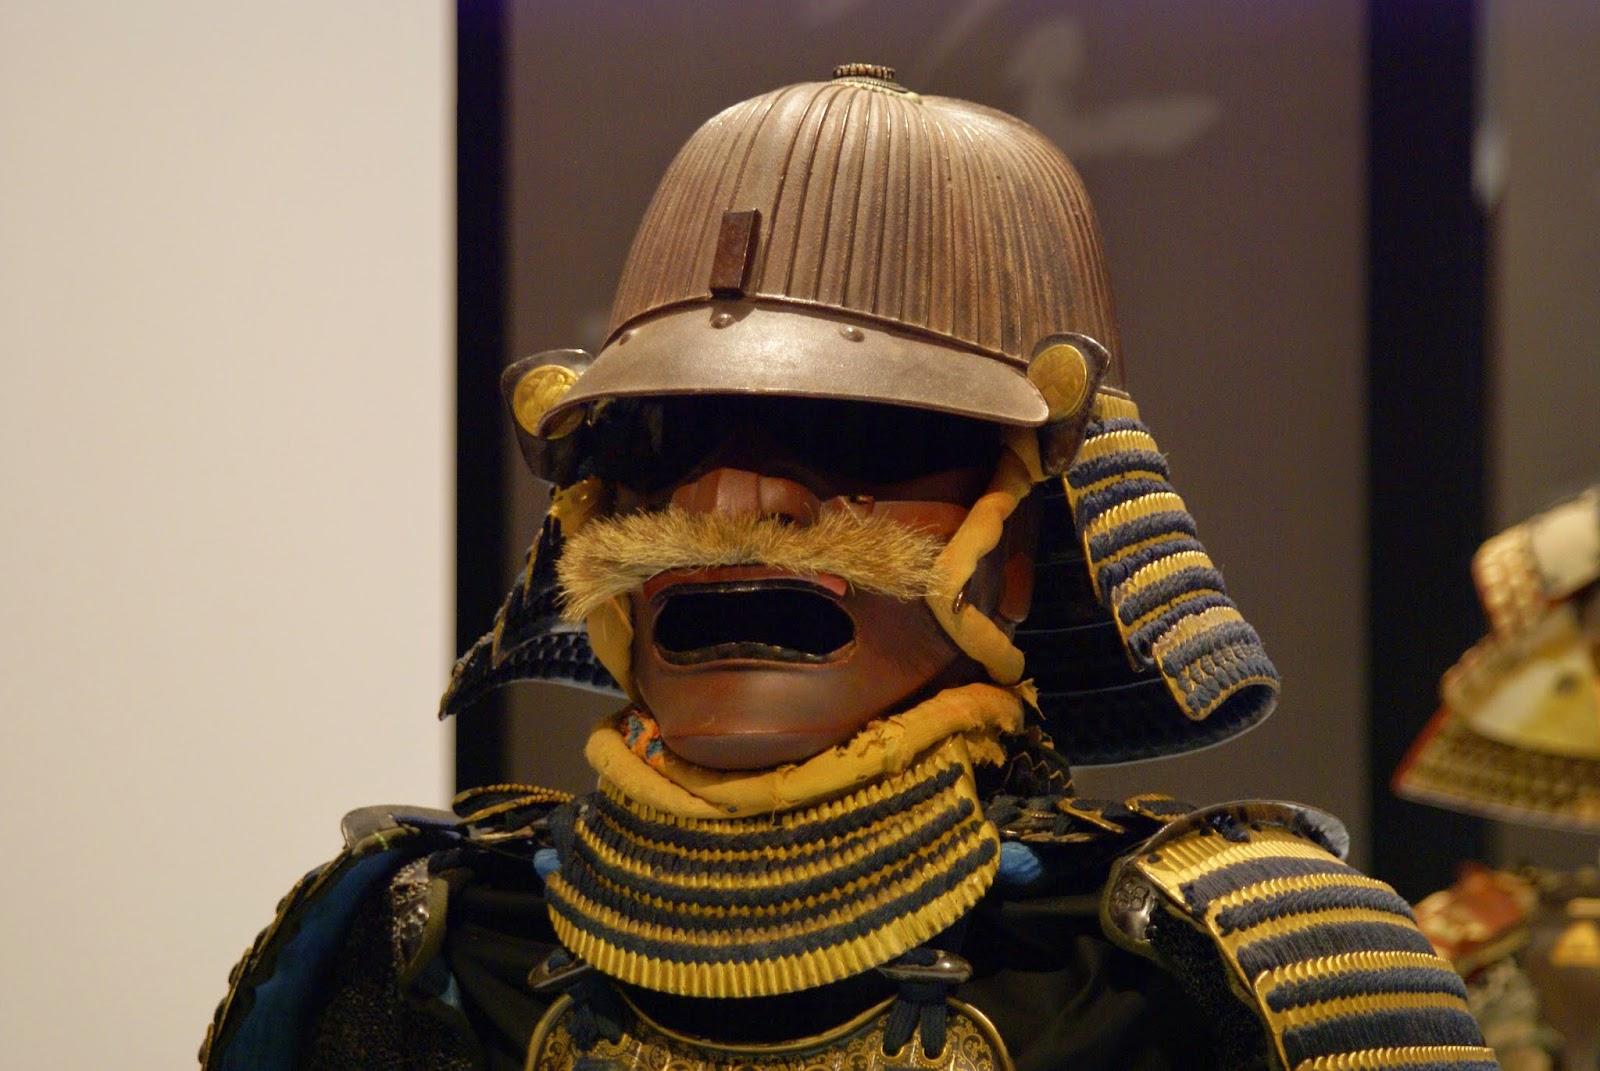 armure japonaise armure de samouraï